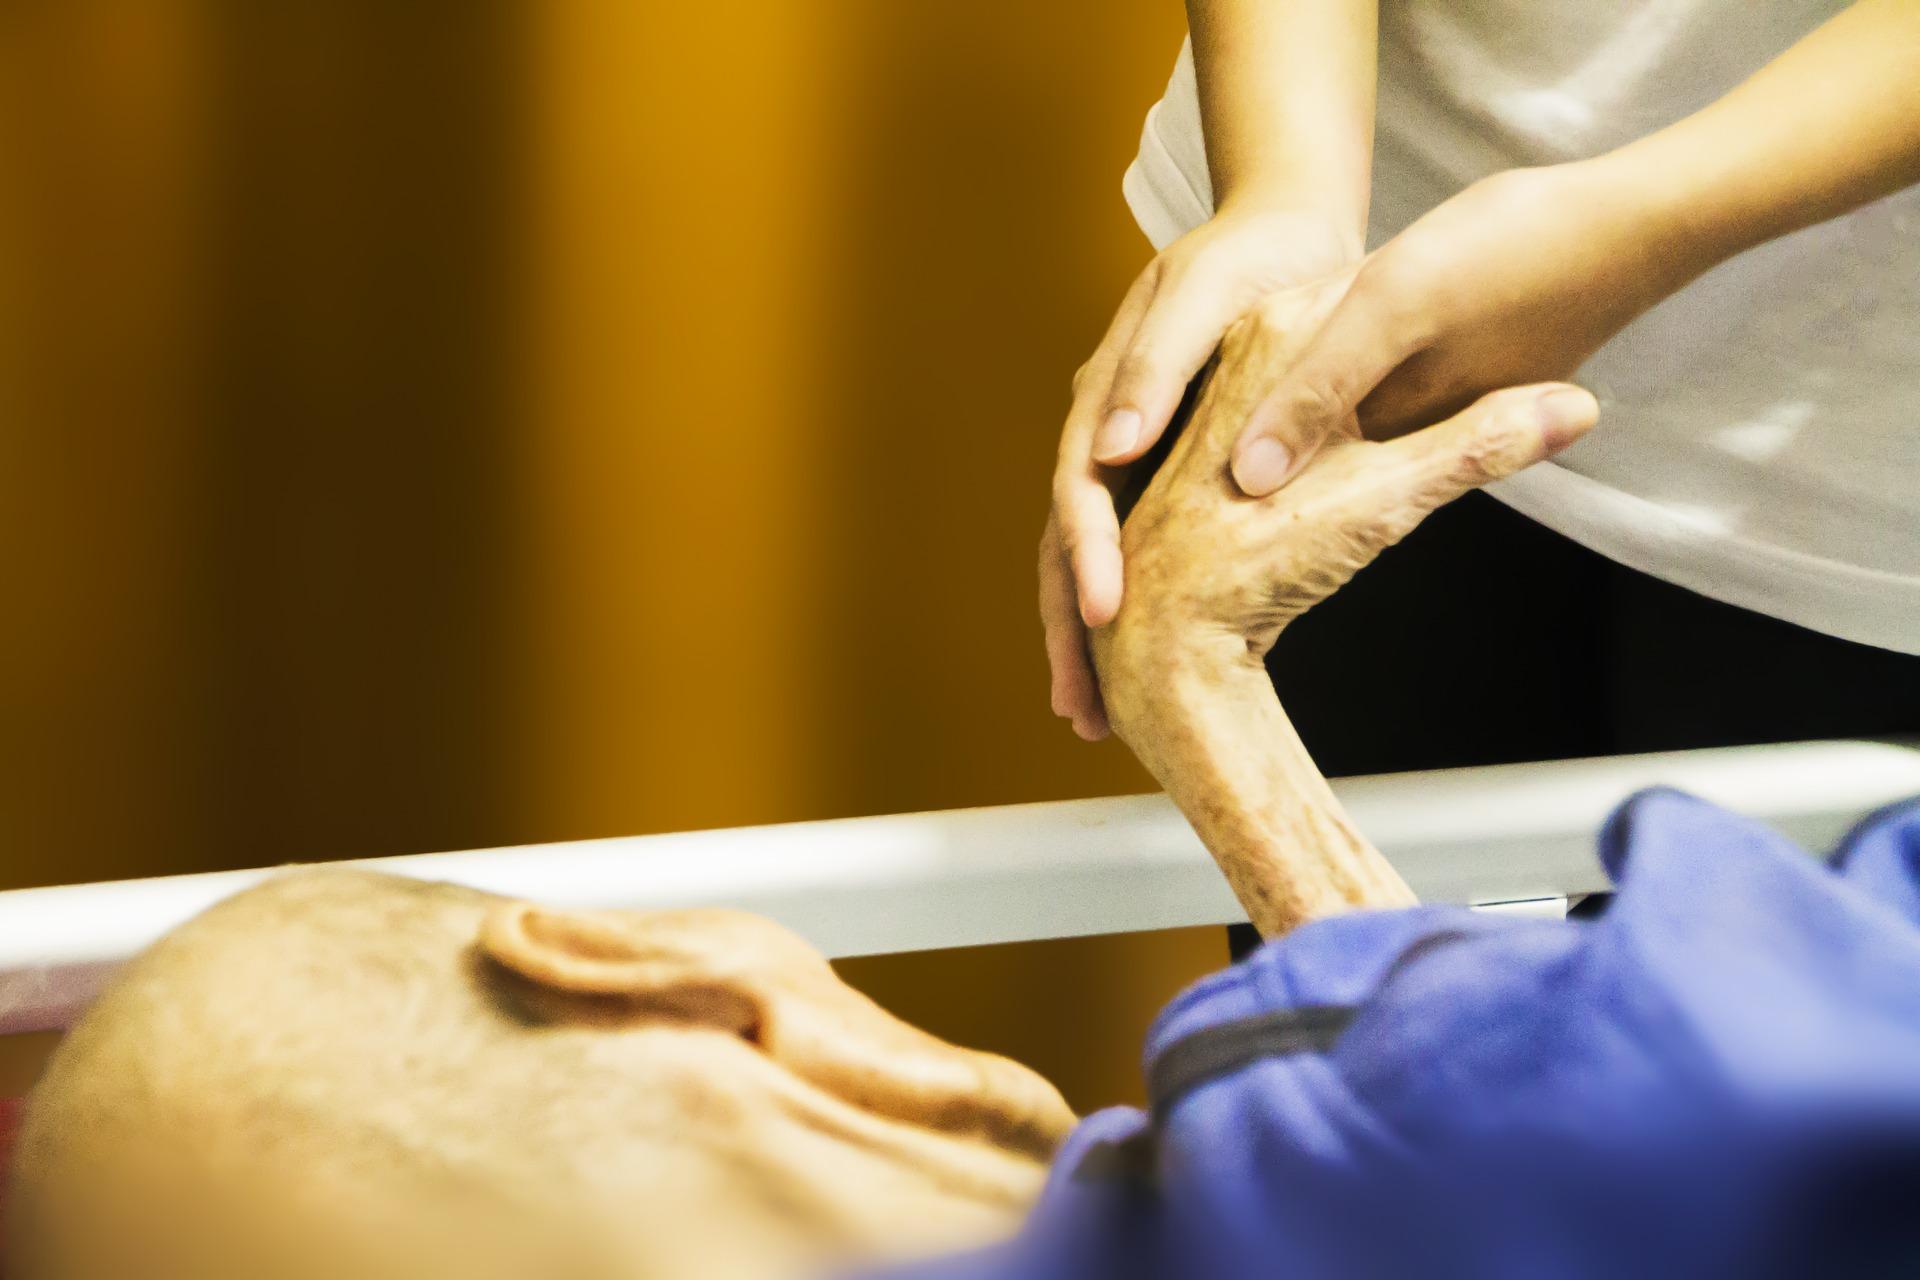 hospicjum, opieka, osoby chore, starsze